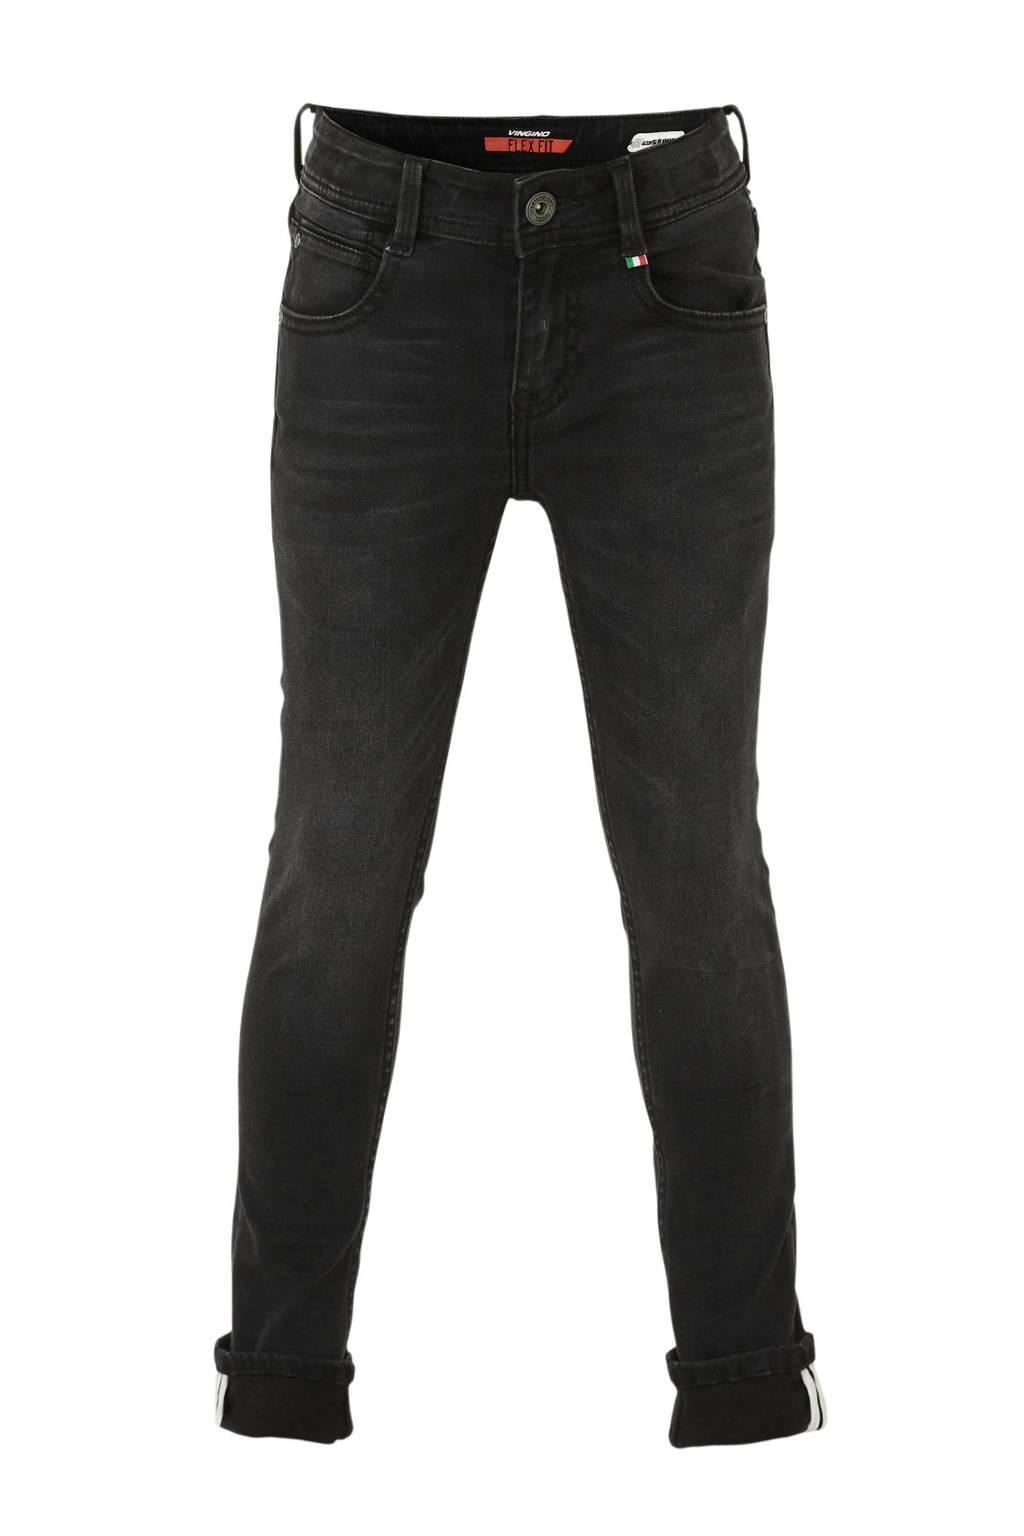 Vingino skinny jeans Apache, Black Vintage